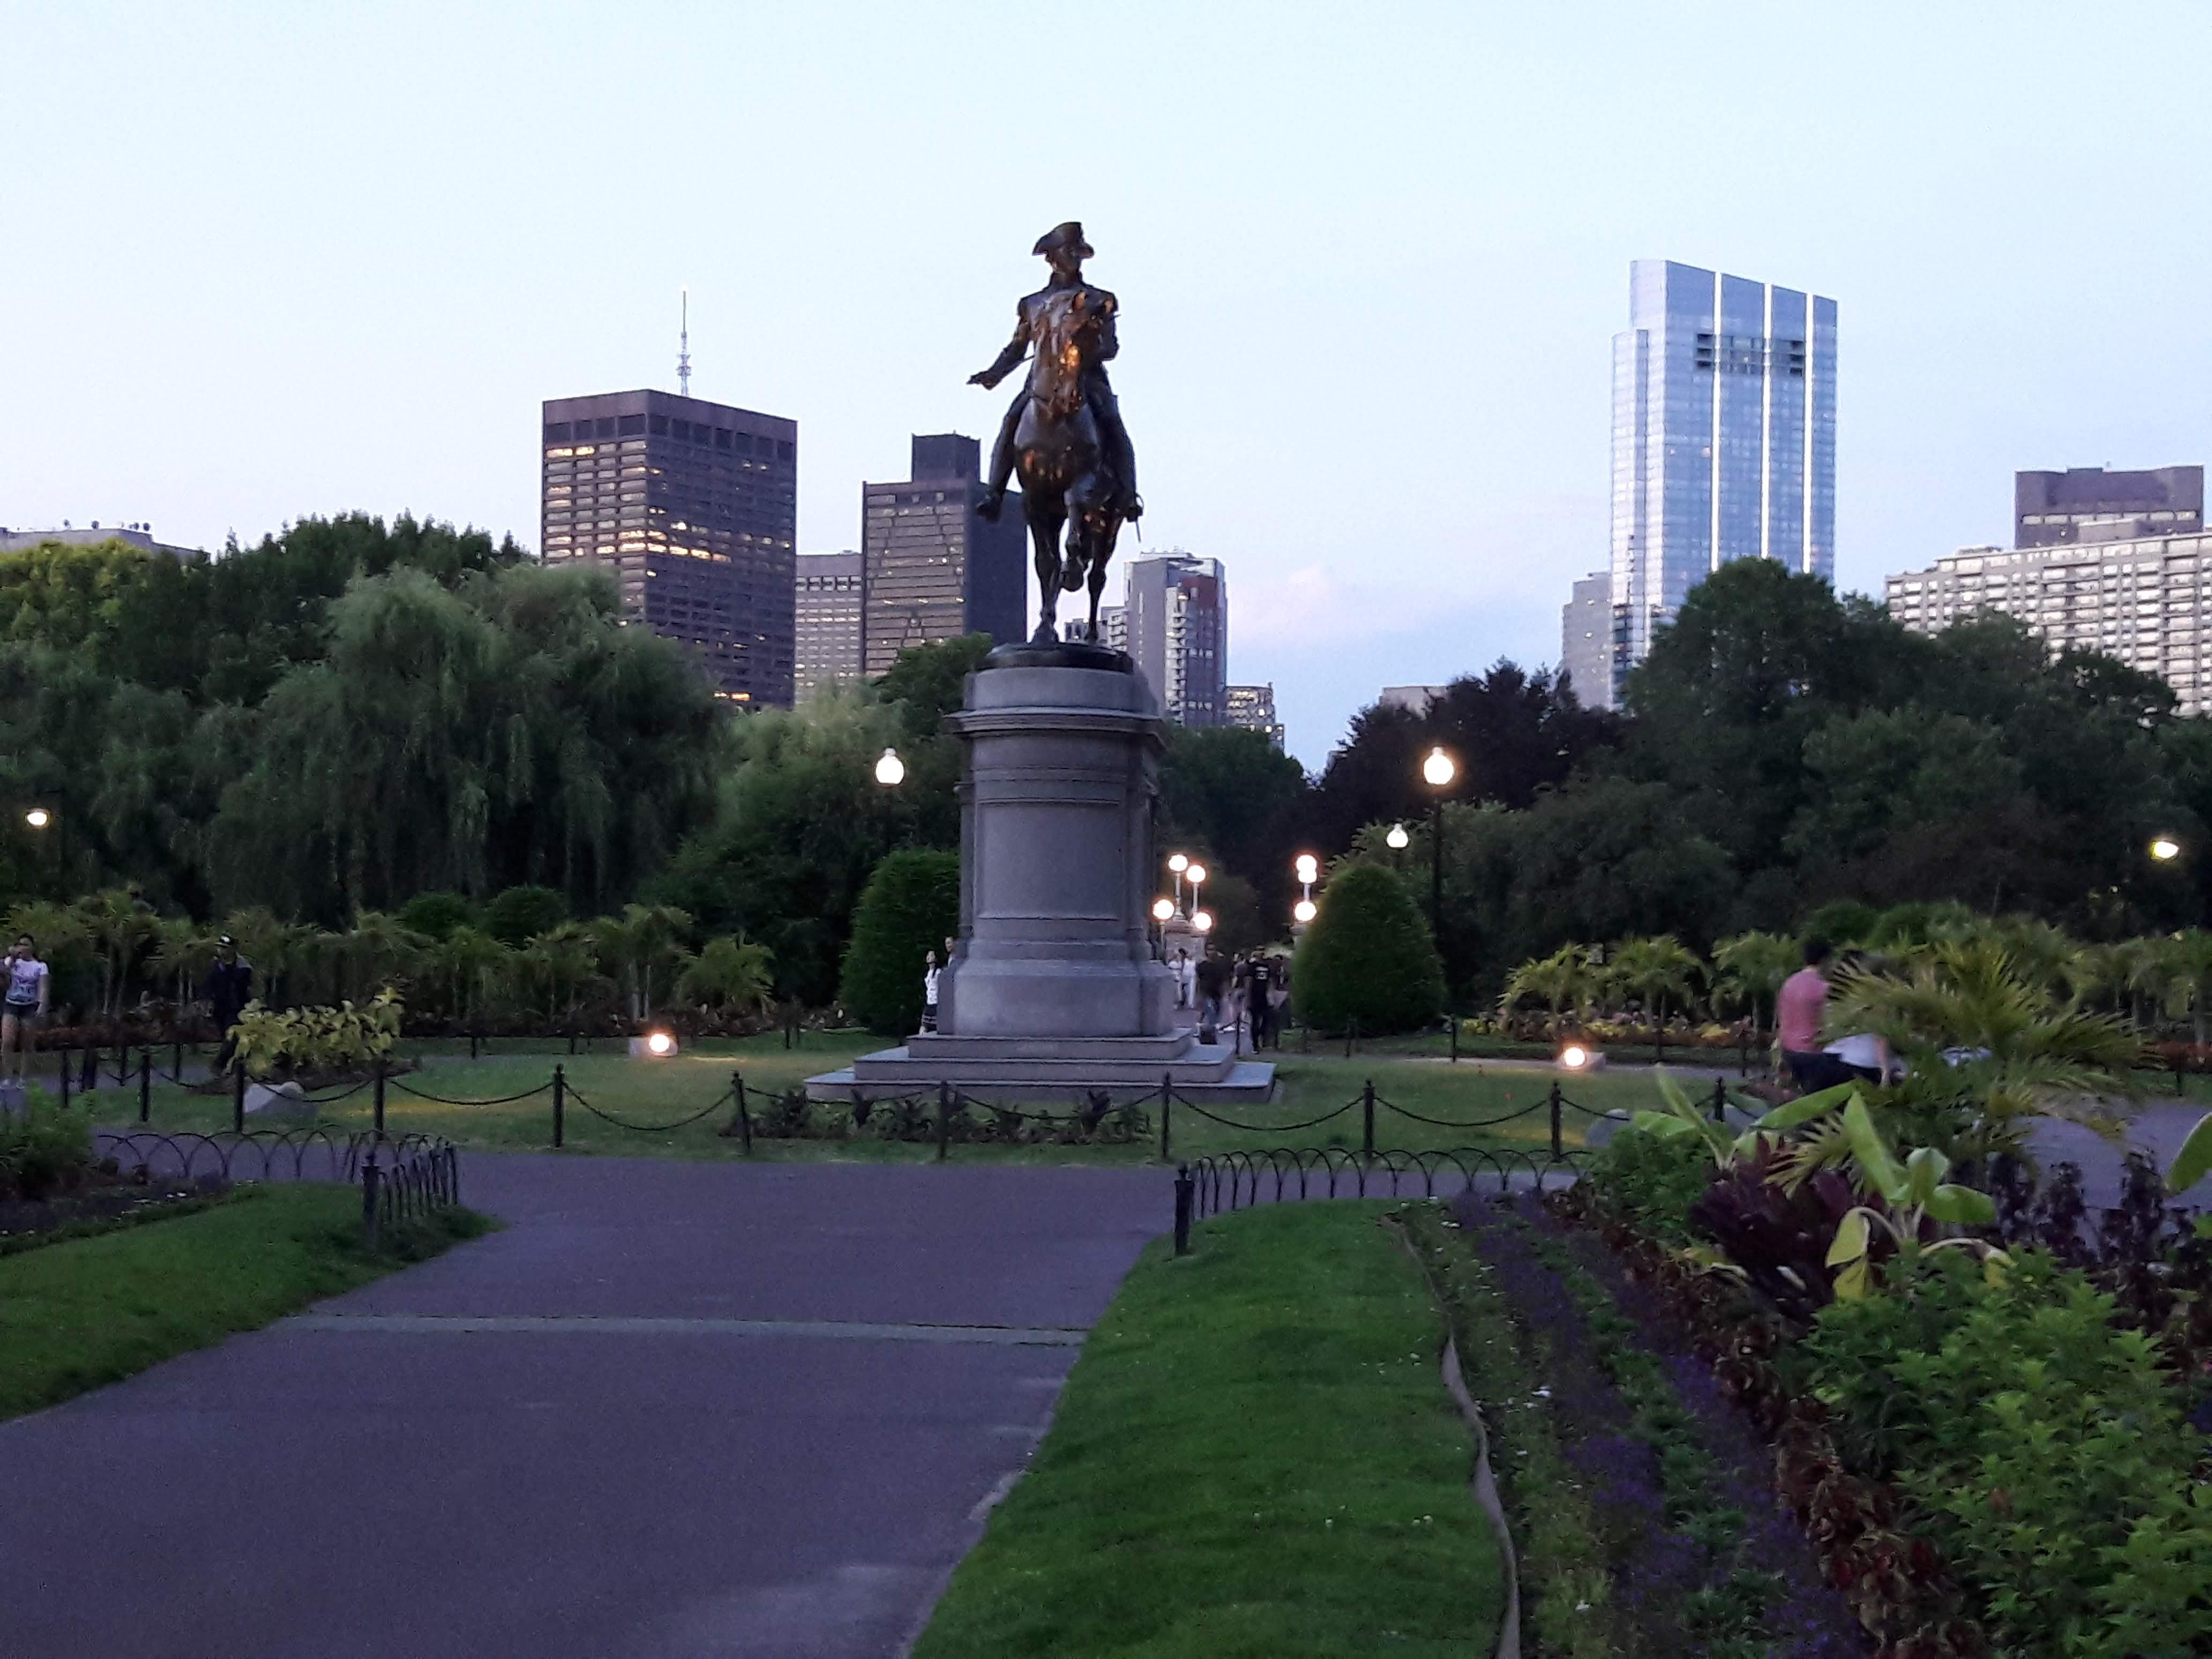 https://assets.sourcemedia.com/a3/86/056d46164e6ba44d9a5ffd8caea5/boston-public-garden-2018-cuna-acuc-cuj-063018.jpg